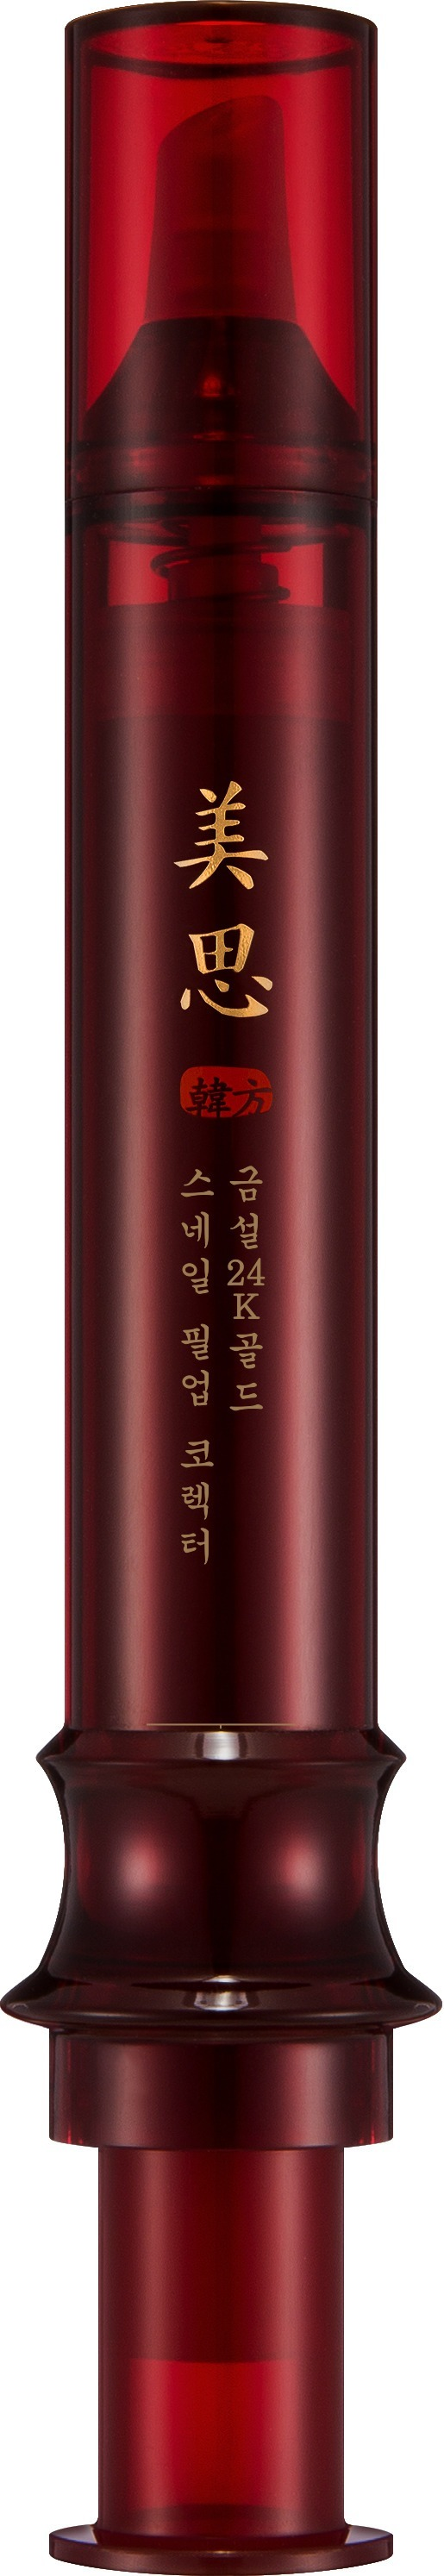 Missha Geum Sul K Gold Snail Fillup